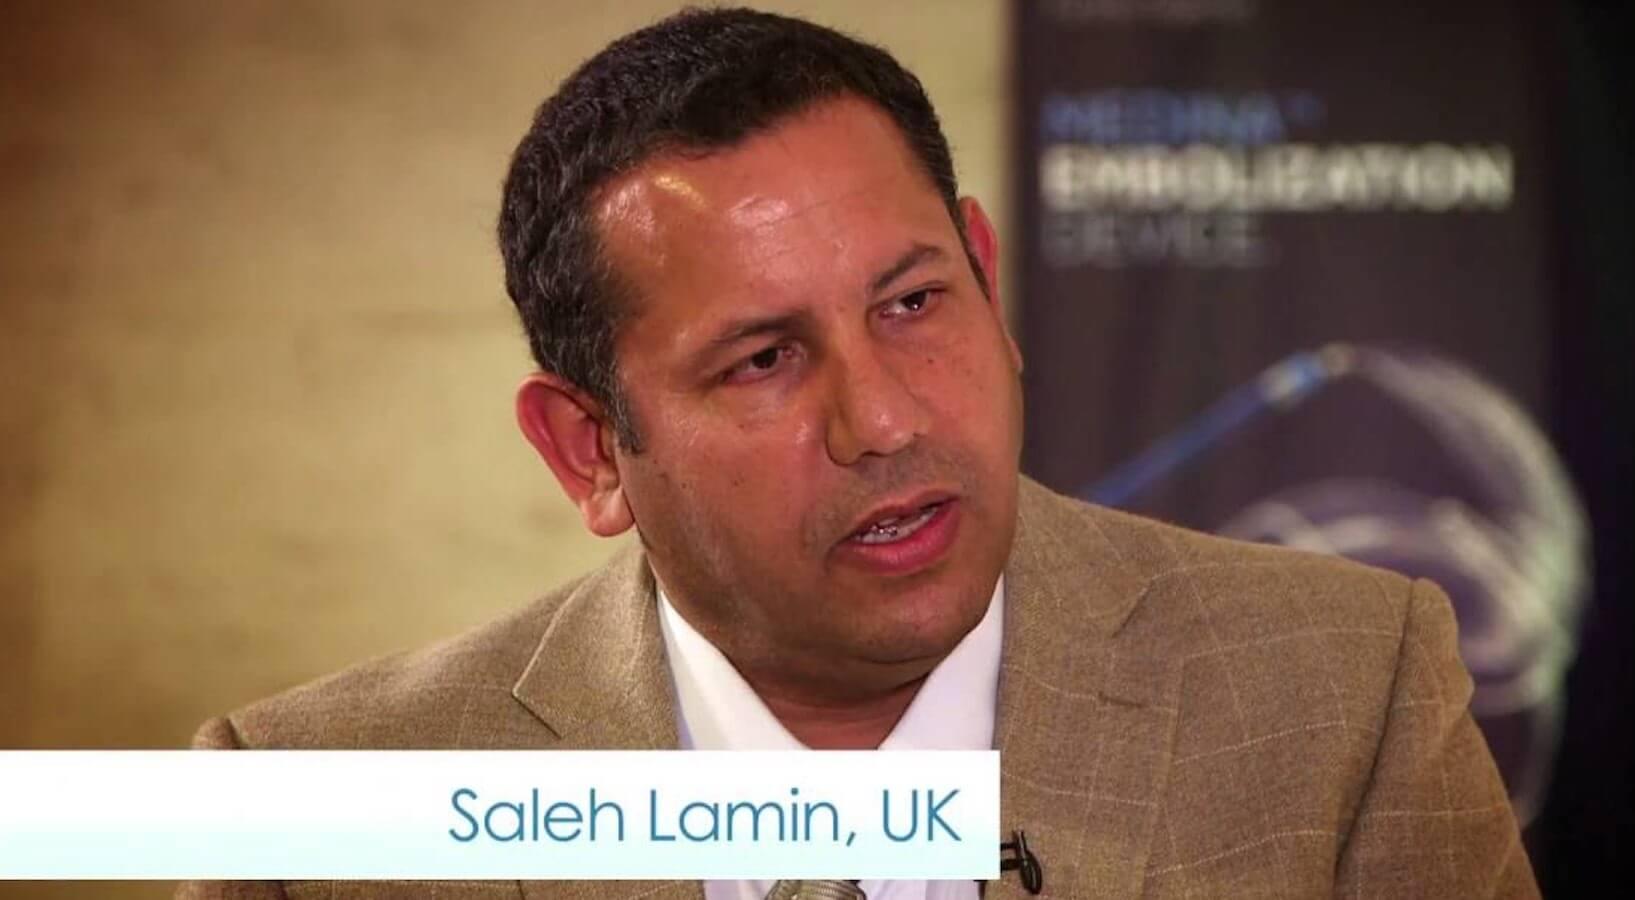 Saleh Lamin belongs to the ESMINT ExCom